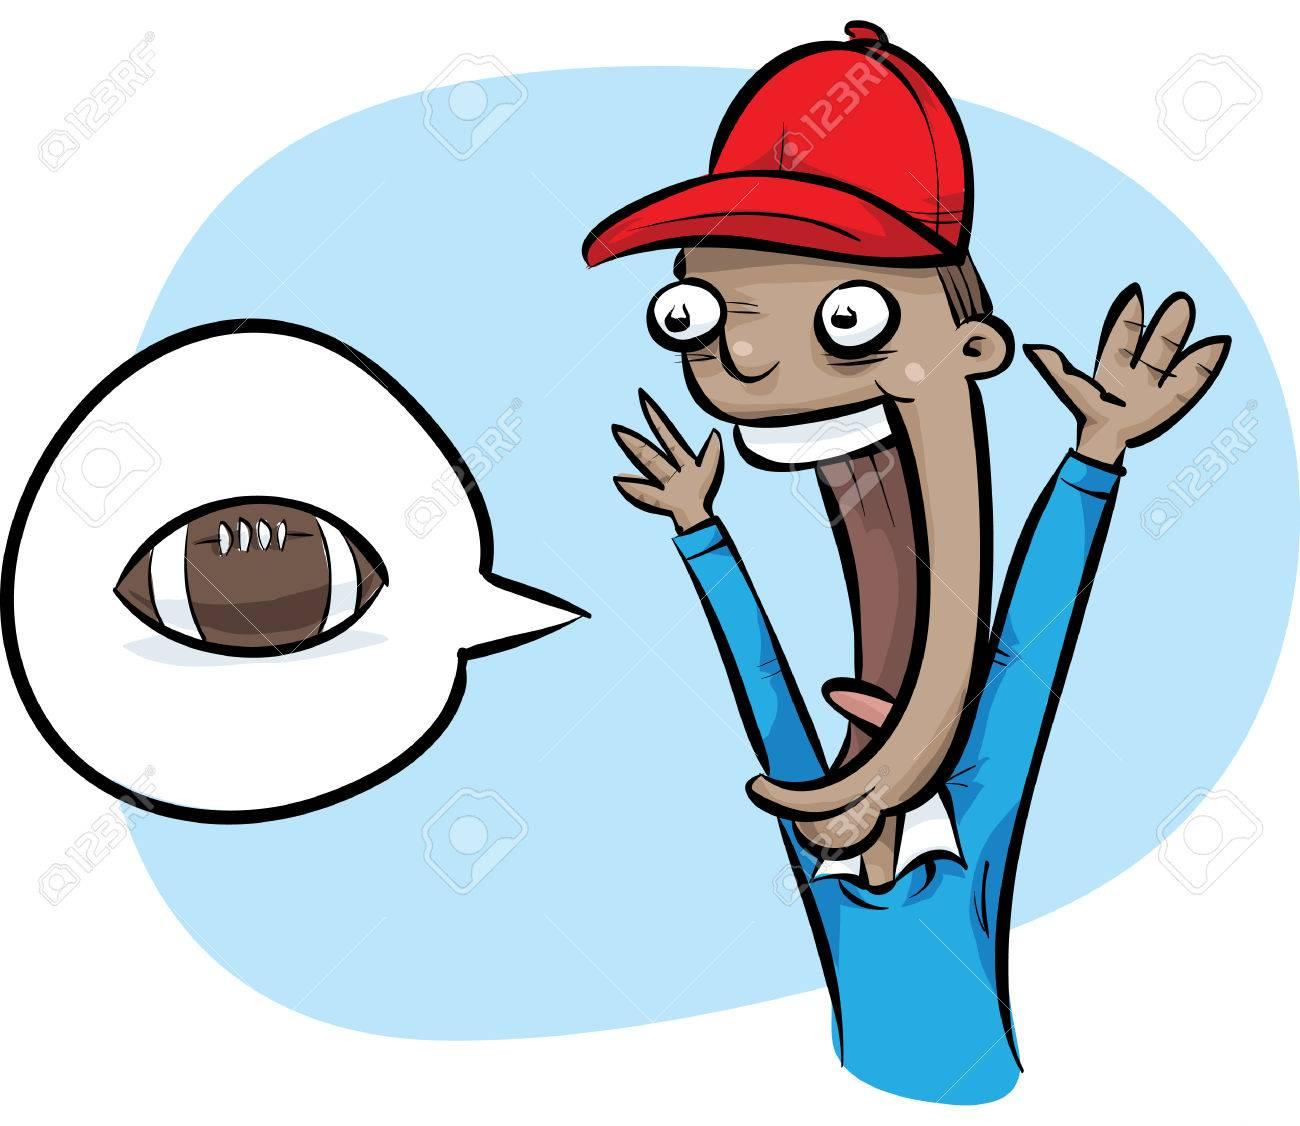 football fan clipart. a cartoon football fan cheering for his team. stock vector - 29156837 clipart